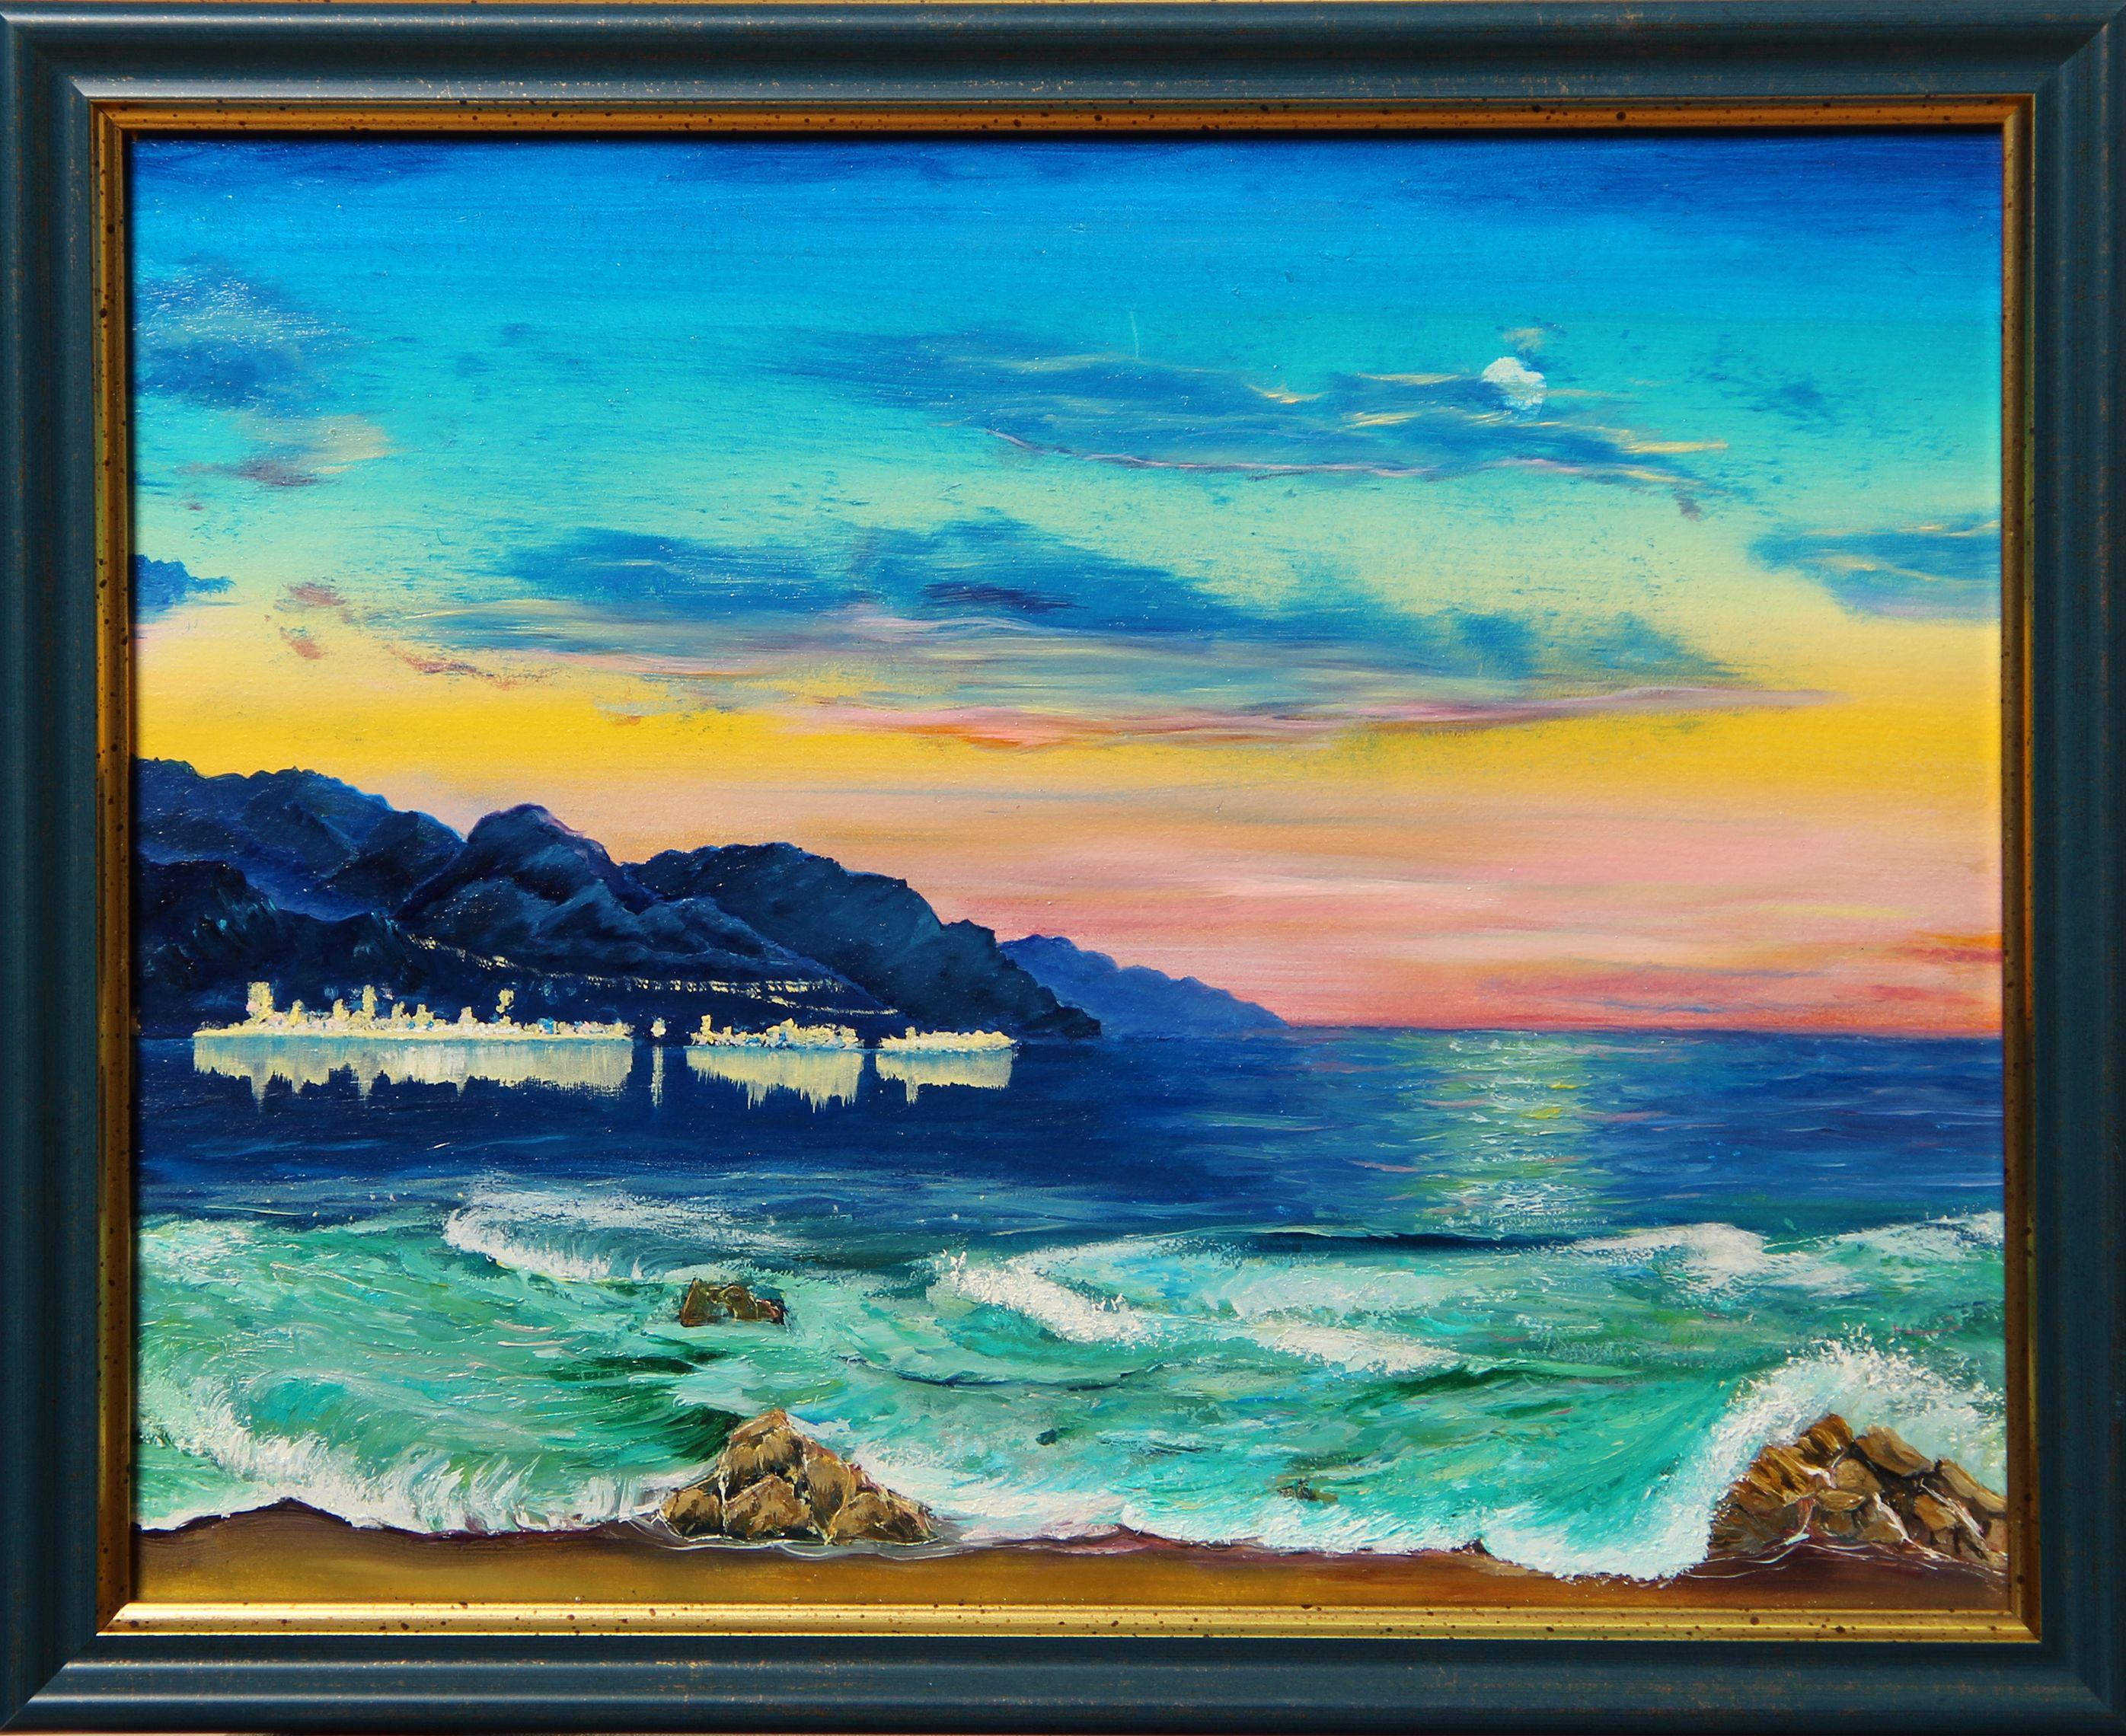 5. Nekrasov AD Evening. 25  30  0.3 cm. Oil on primed hardboard. In frame.